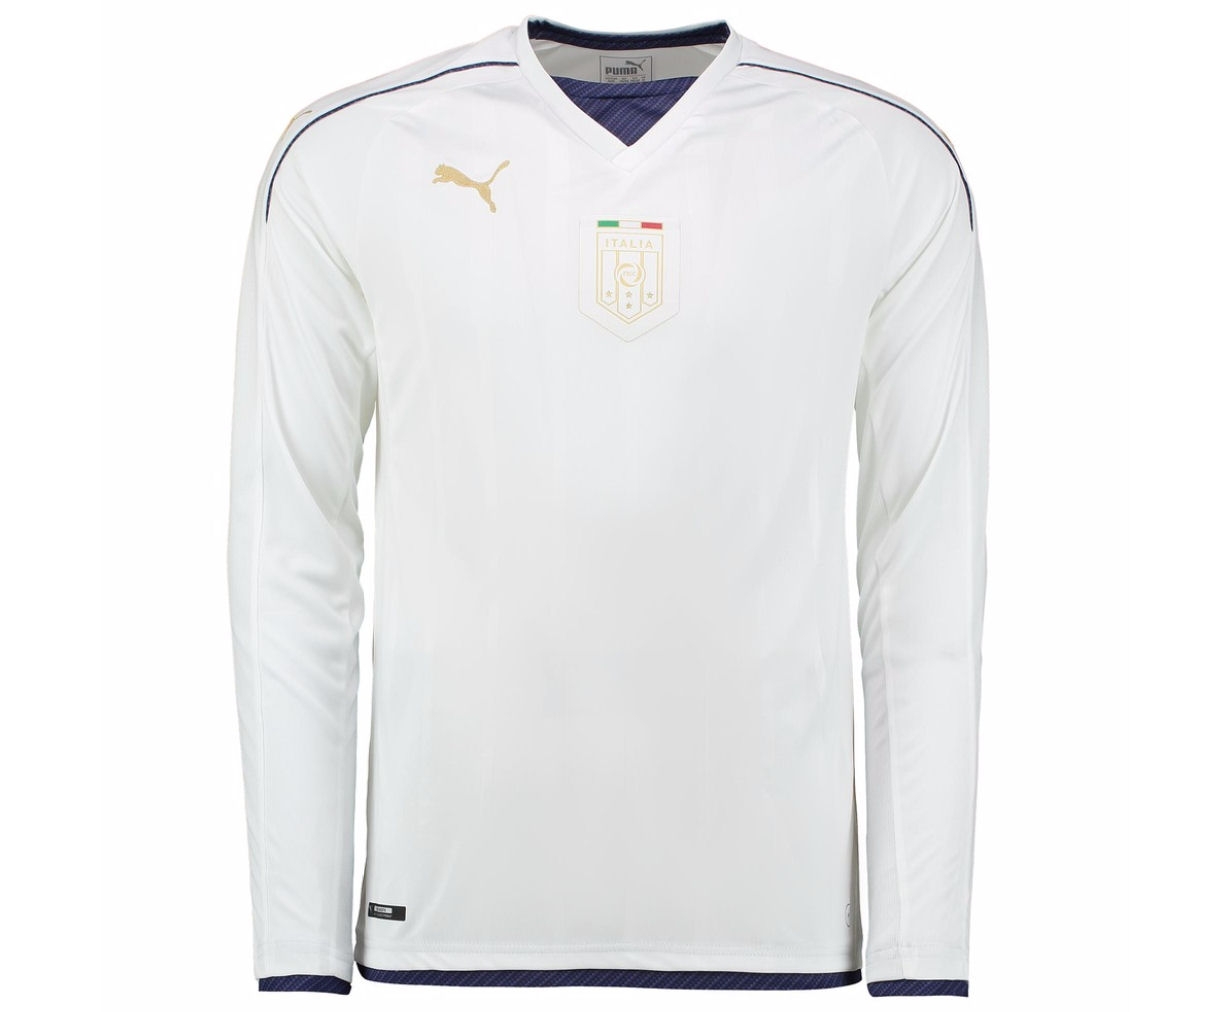 Italy 2006 Puma Tribute Away Long Sleeve Shirt